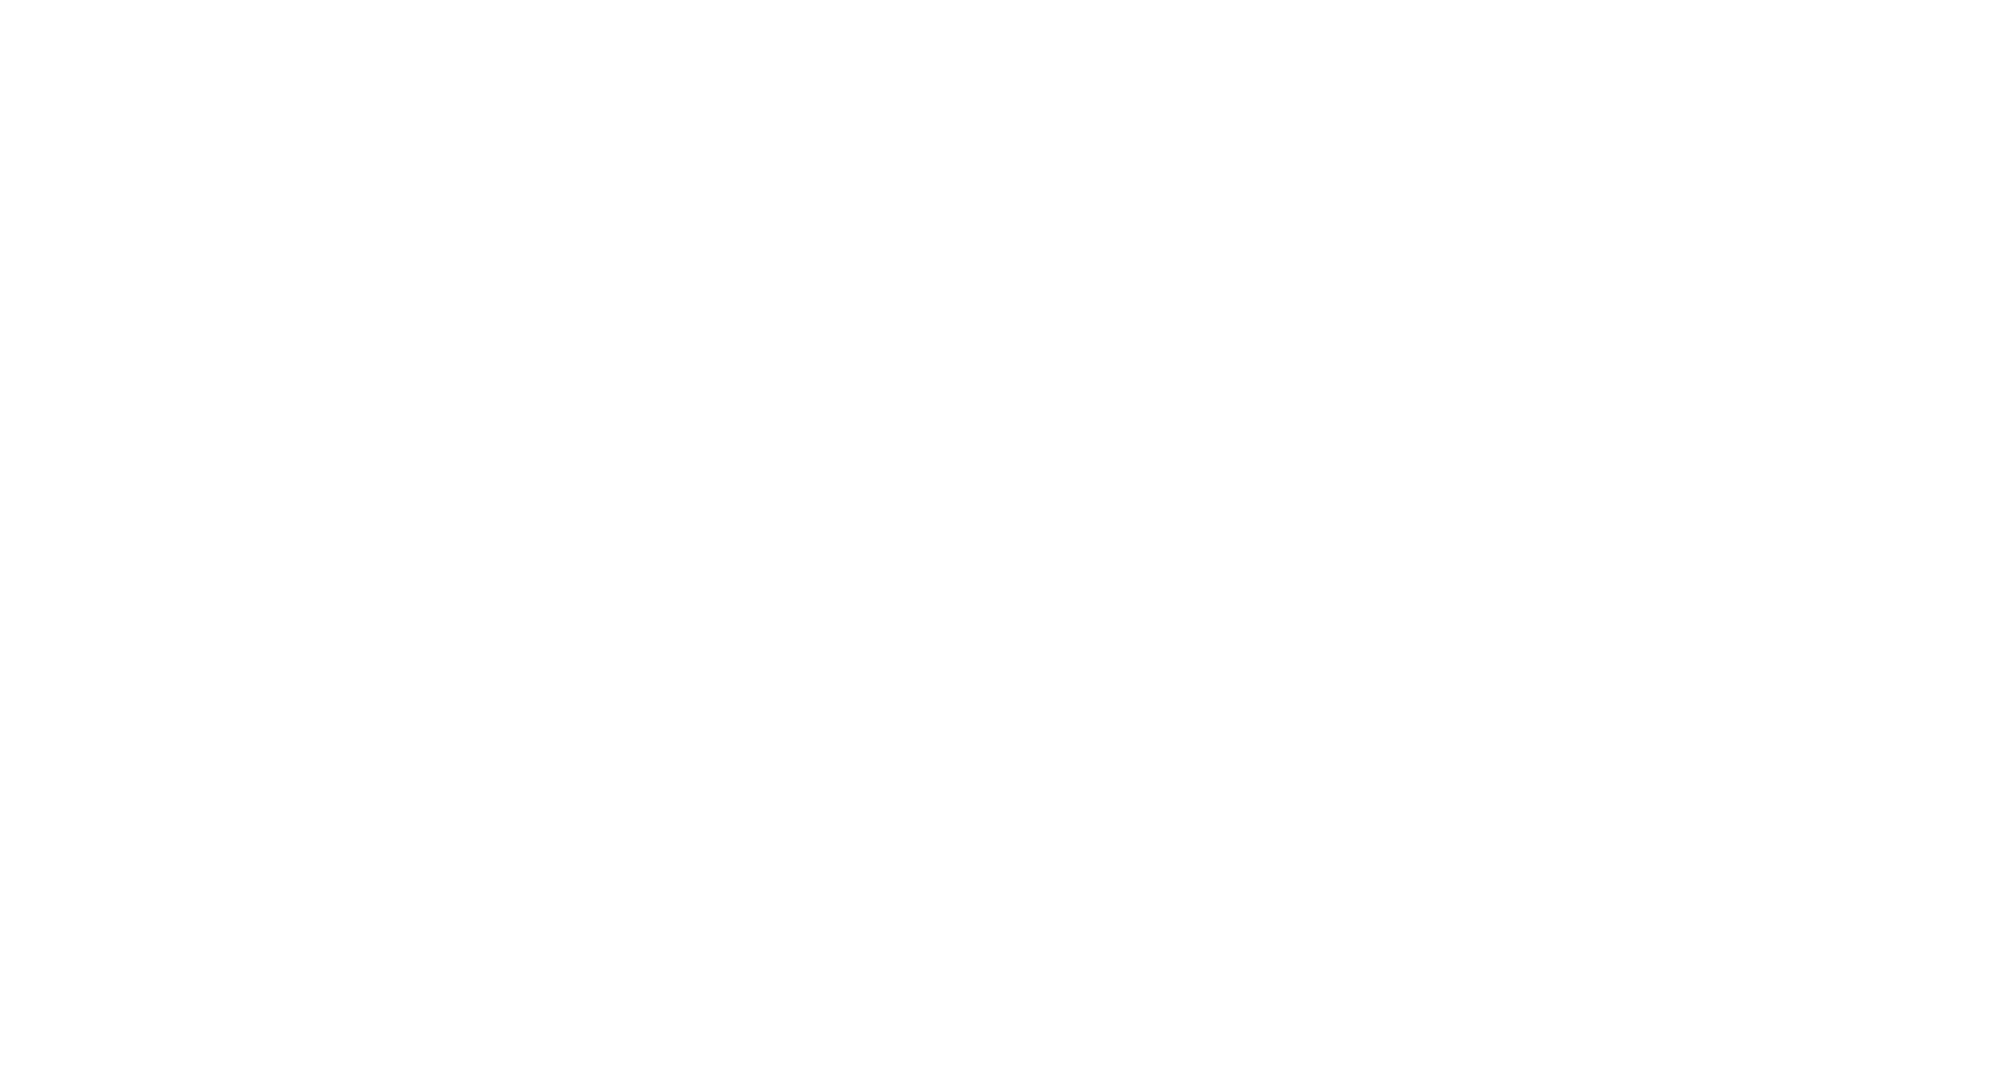 dvelop-logo-invers-Jan-29-2021-04-09-24-10-PM